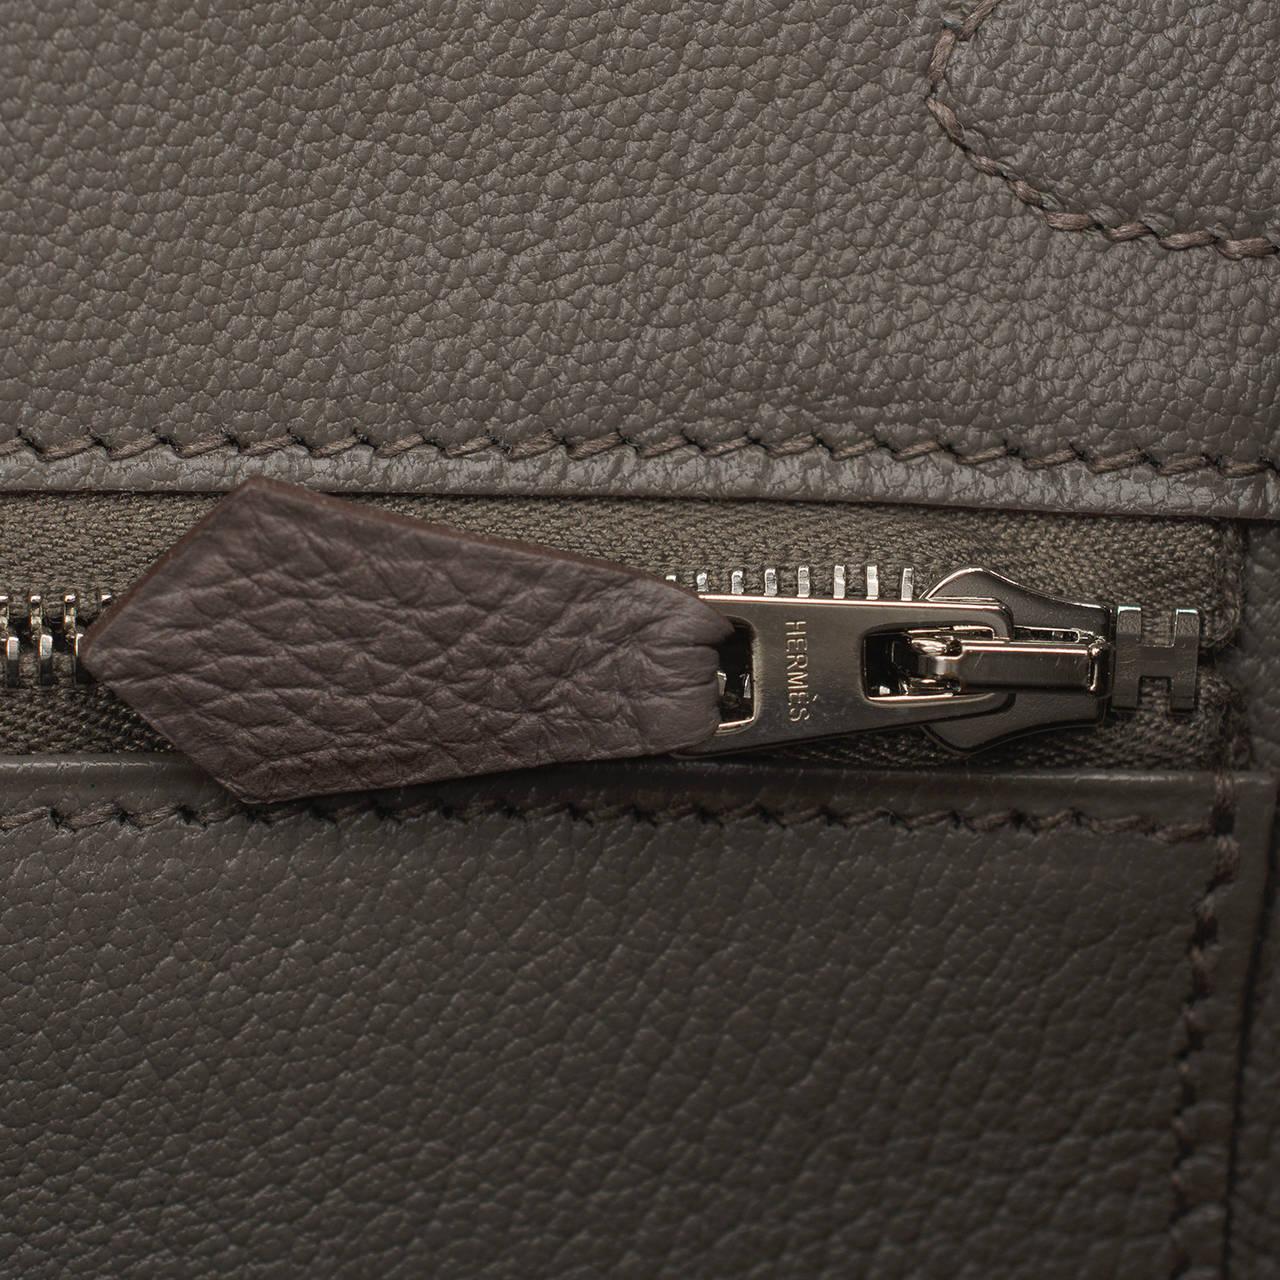 birkin bags replica - Hermes Etain Togo Birkin 30cm Palladium Hardware at 1stdibs